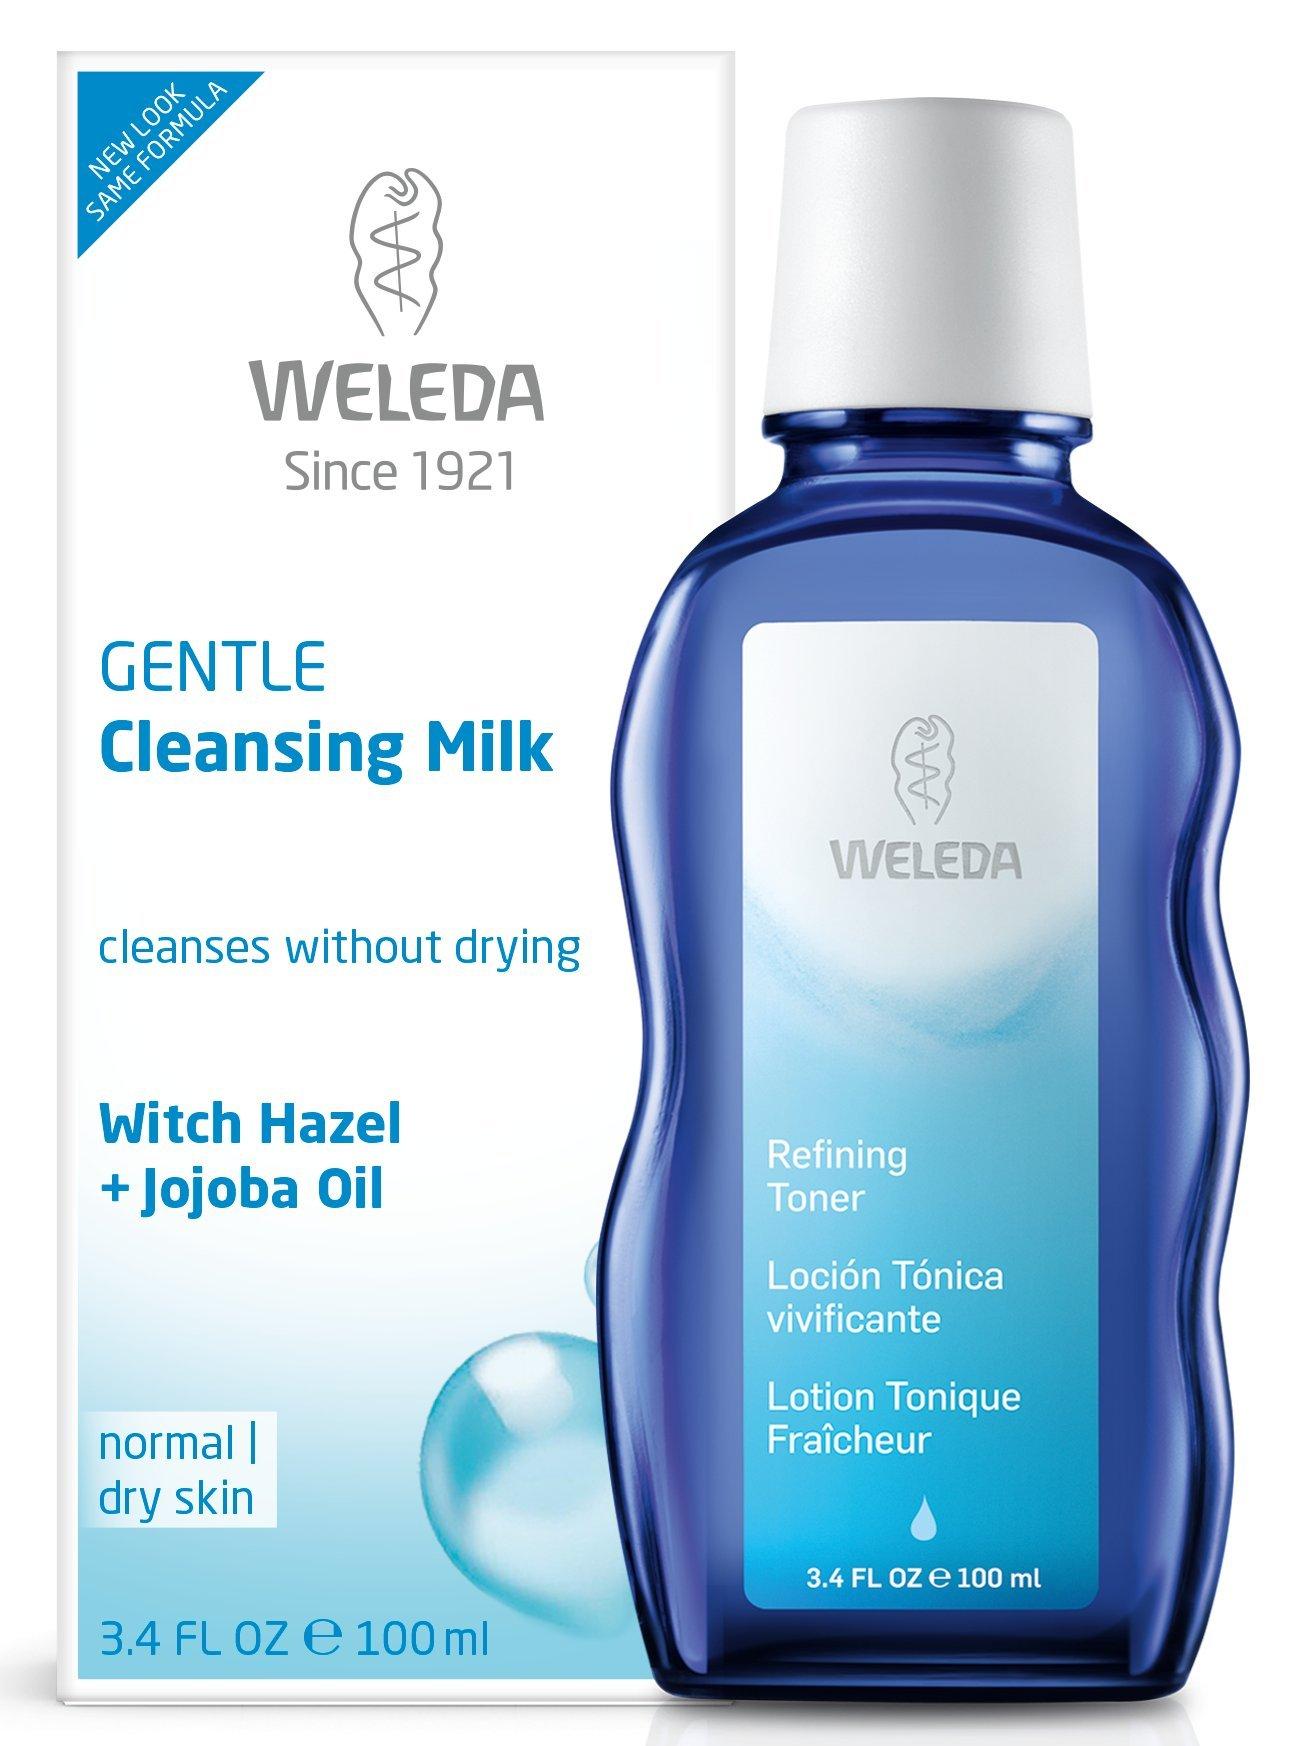 Weleda Gentle Cleansing Milk, 3.4-Fluid Ounce